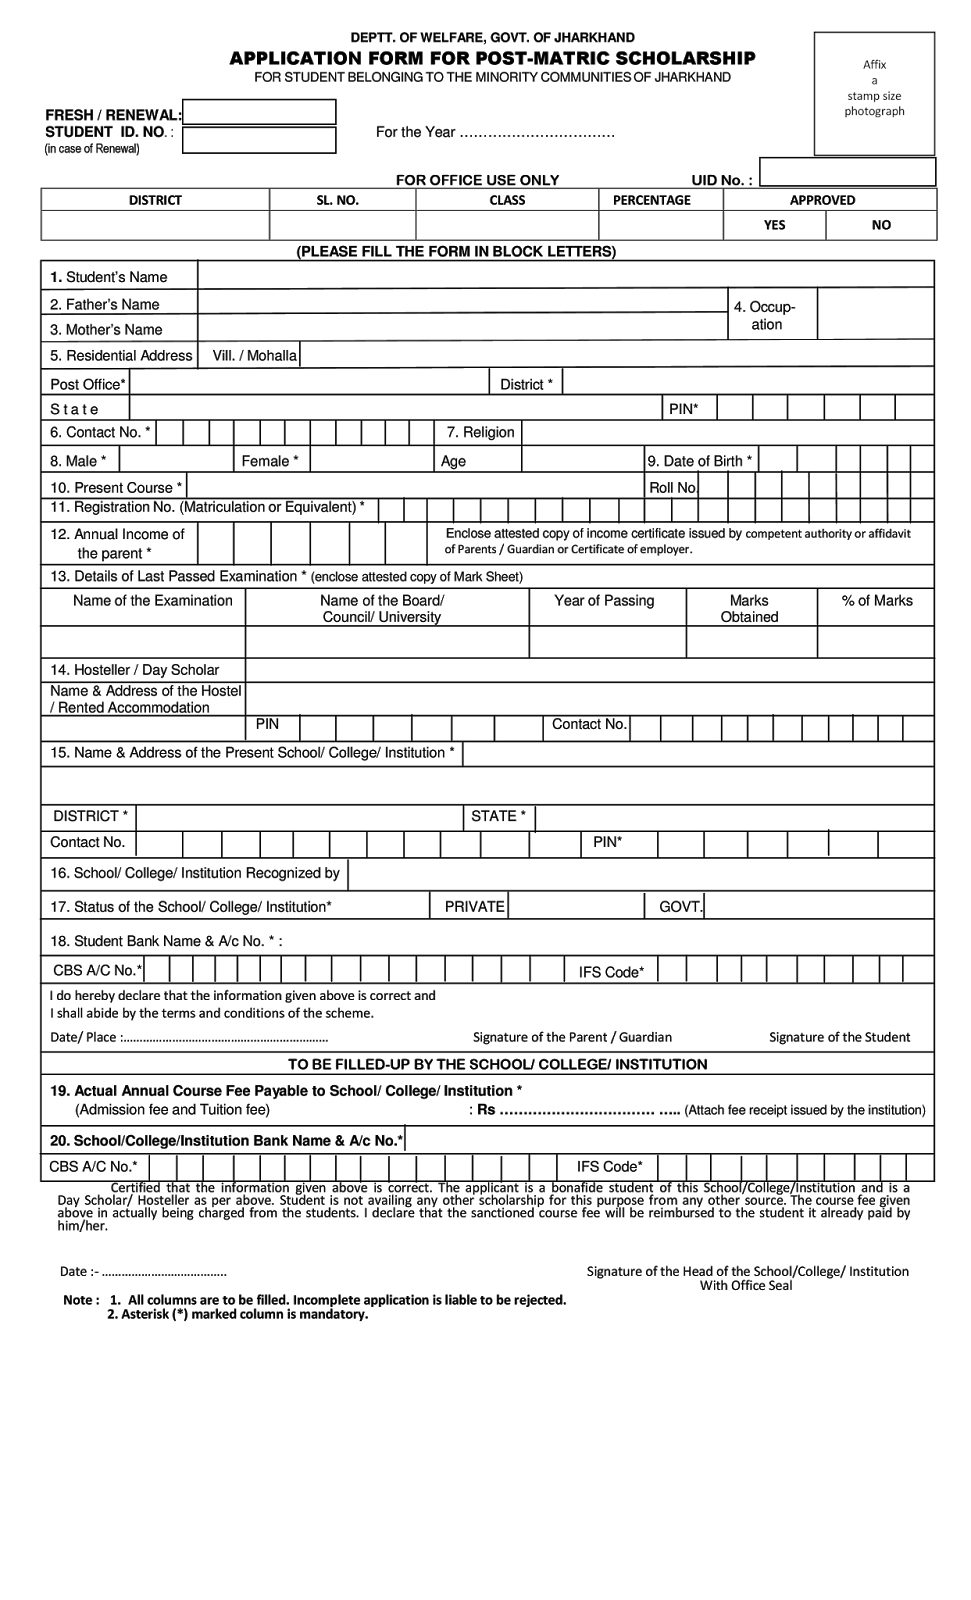 D201215127-0 Job Application Form Of State Bank India on chase bank application form, bank employment application form, business application form, sample bank statement form, teacher application form, bank loan application form, bank information form, bank check register form,